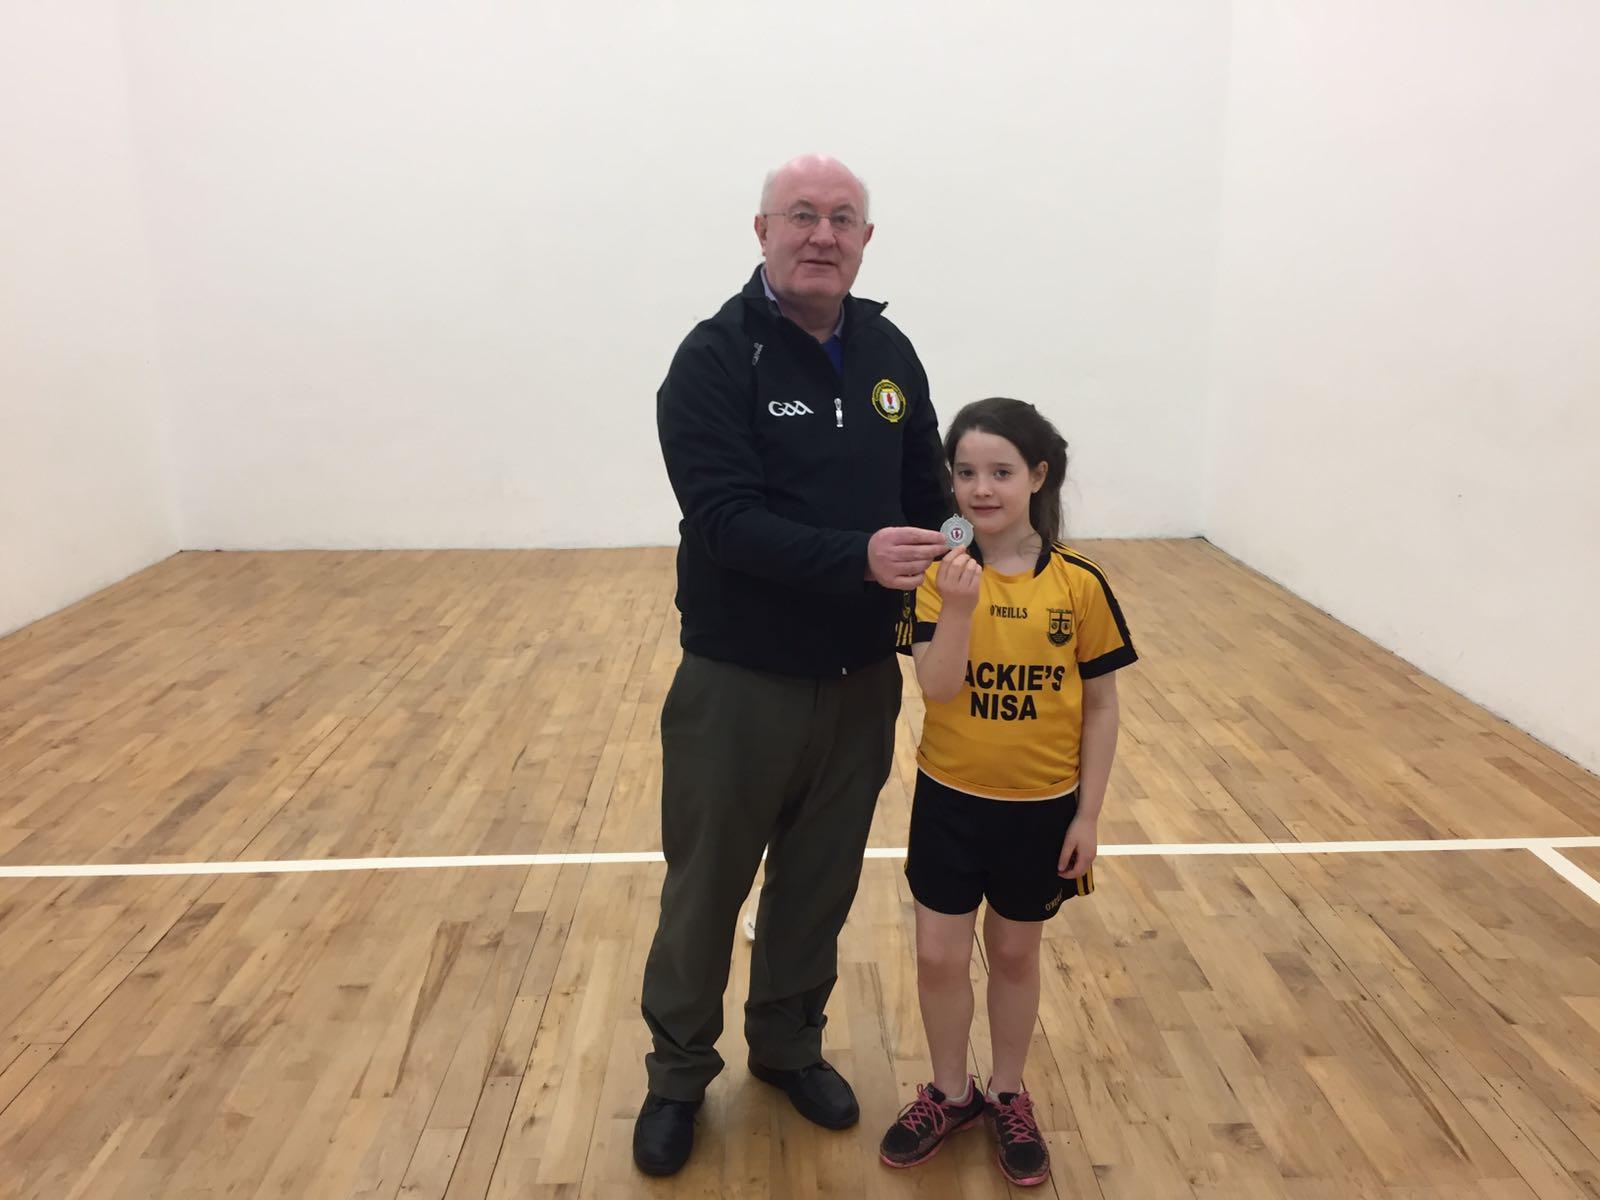 Allianz Cumann na mBunscol Thír Eoghain: 4-Wall Handball Tyrone Finals 2017